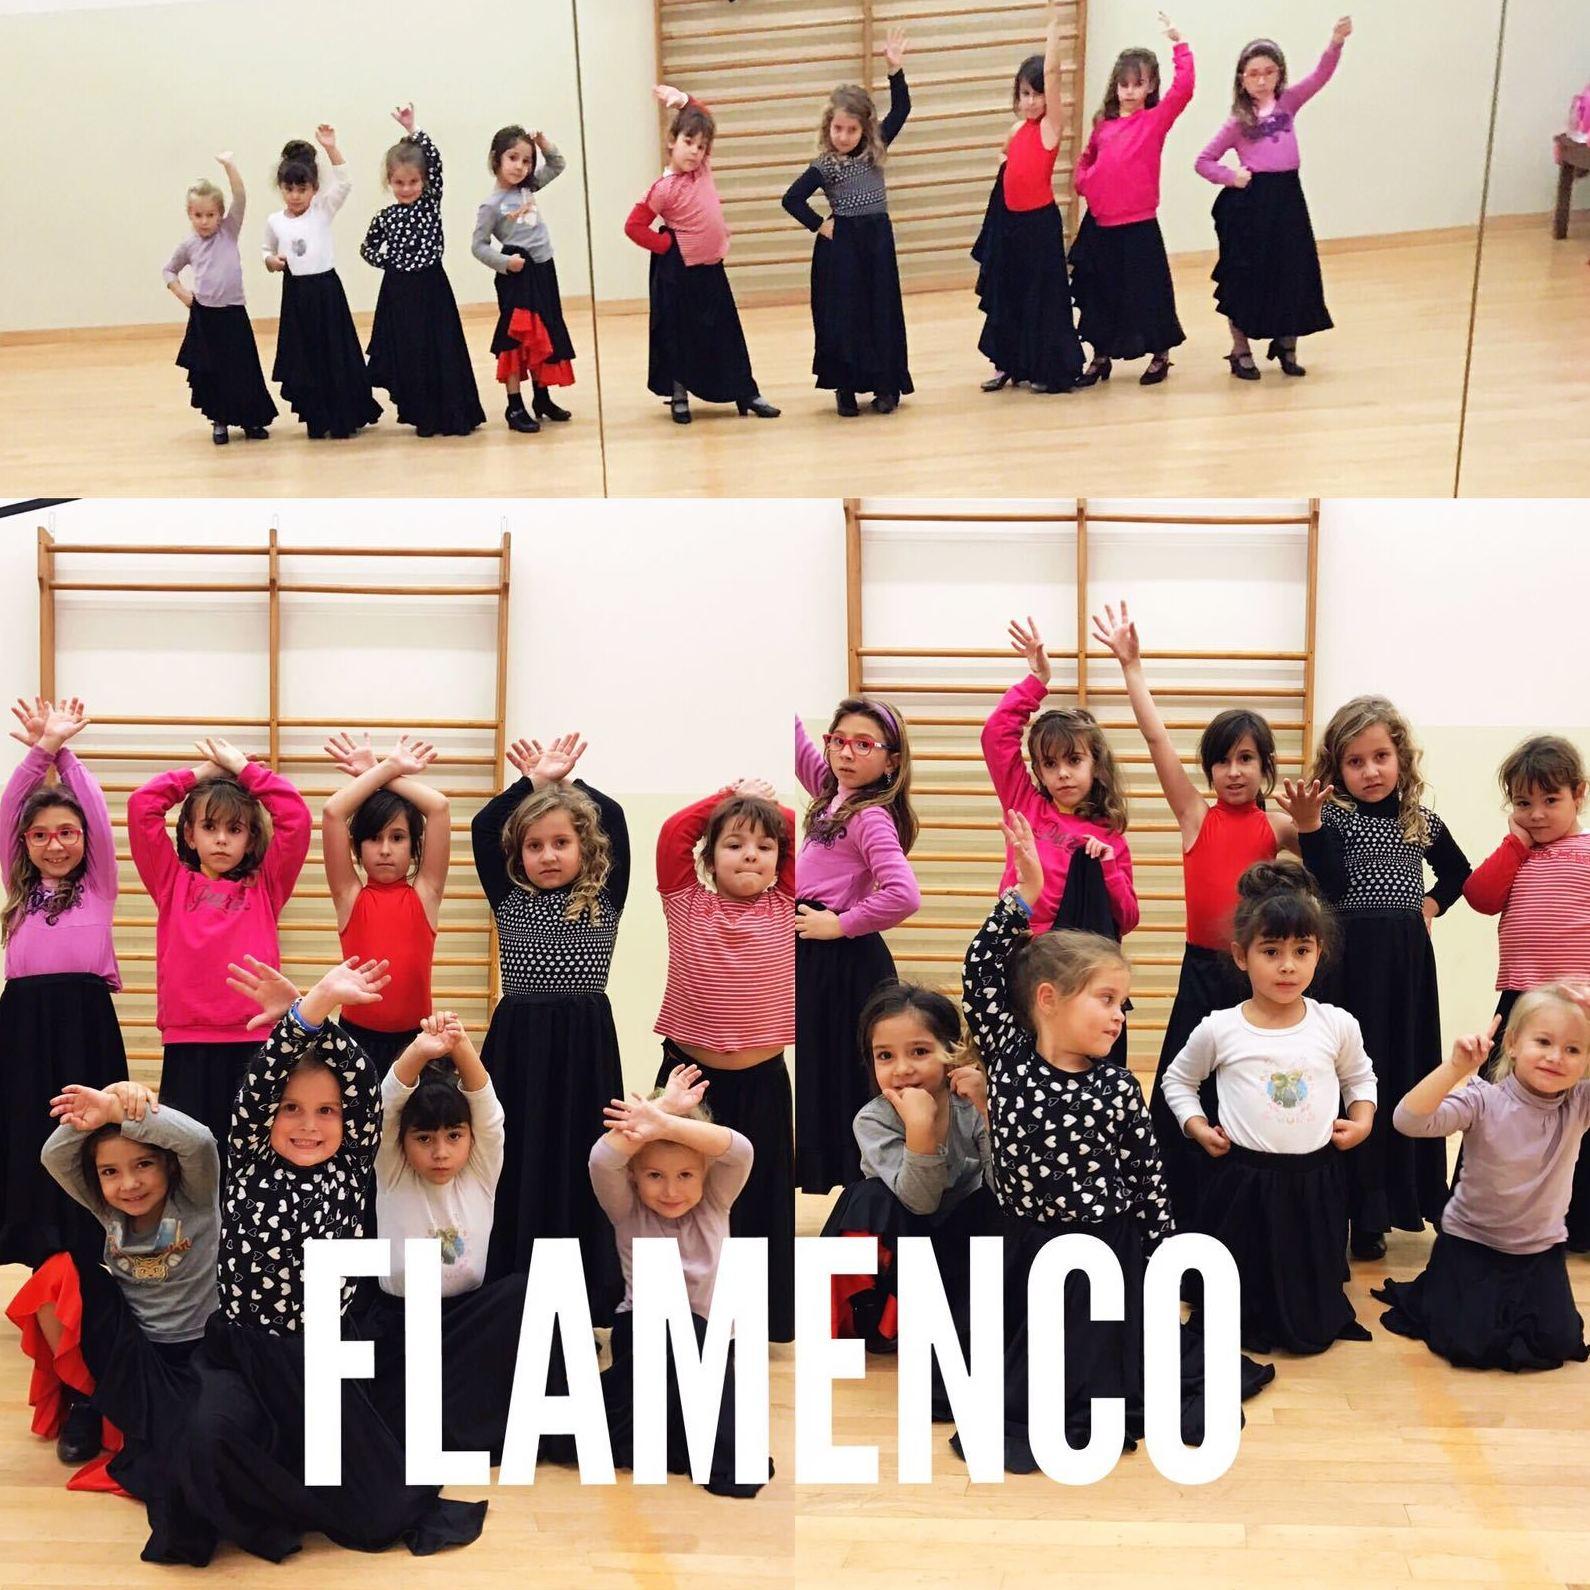 Flamenco Infantil: Actividades y Servicios de Gimnàs Record